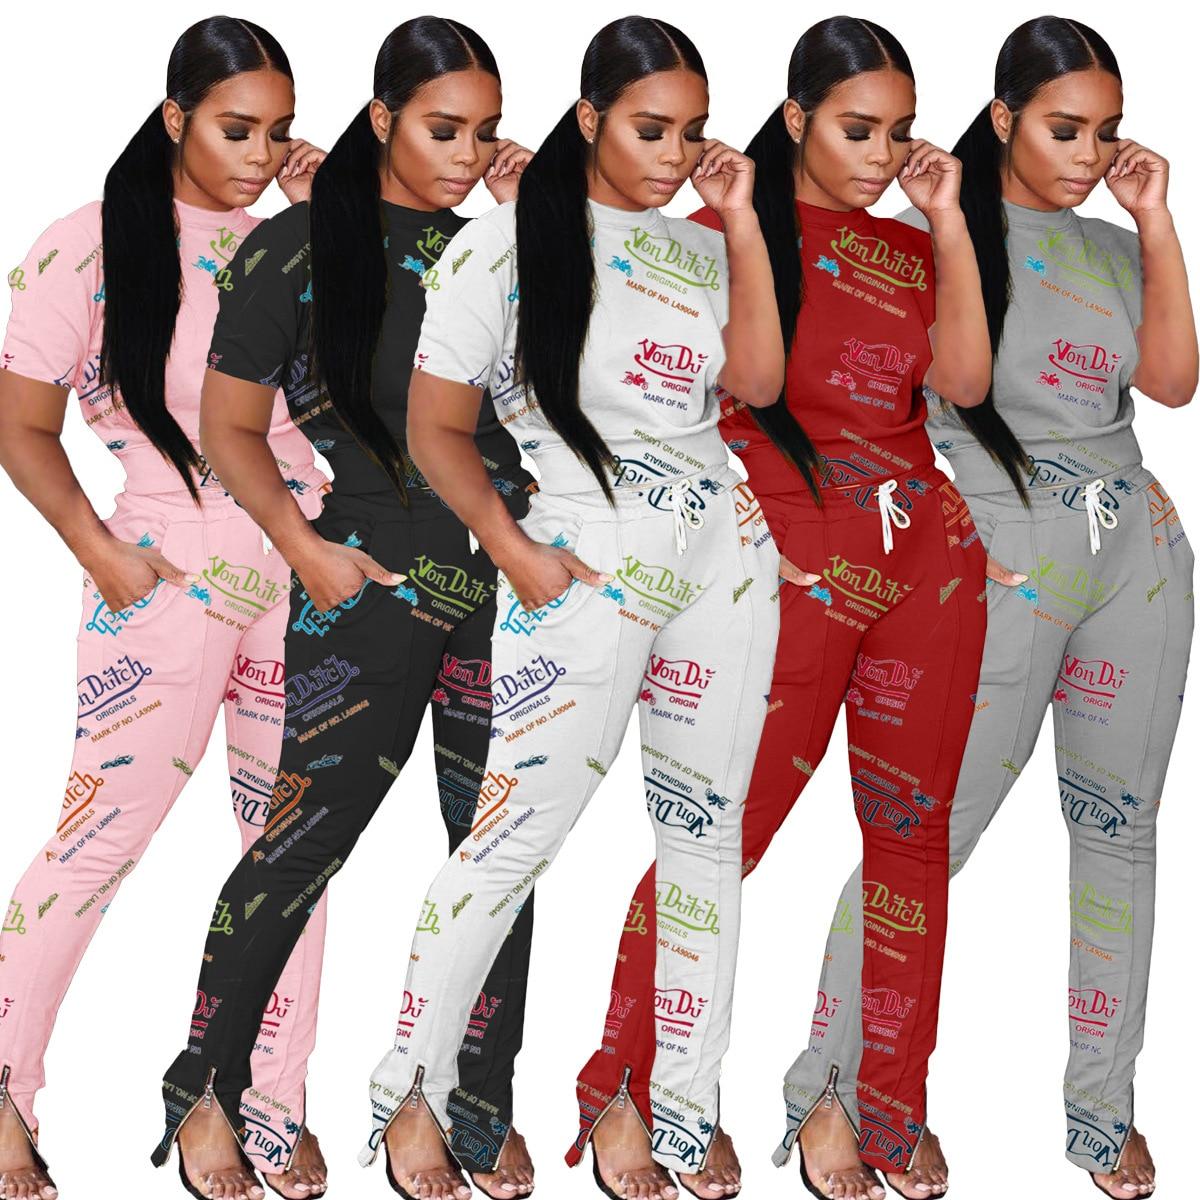 Classy Two Piece Set Women Drawstring Pants Graffiti 2 Piece Sets Summer Outfits Fashion Cotton Von Dutch Sweatsuits